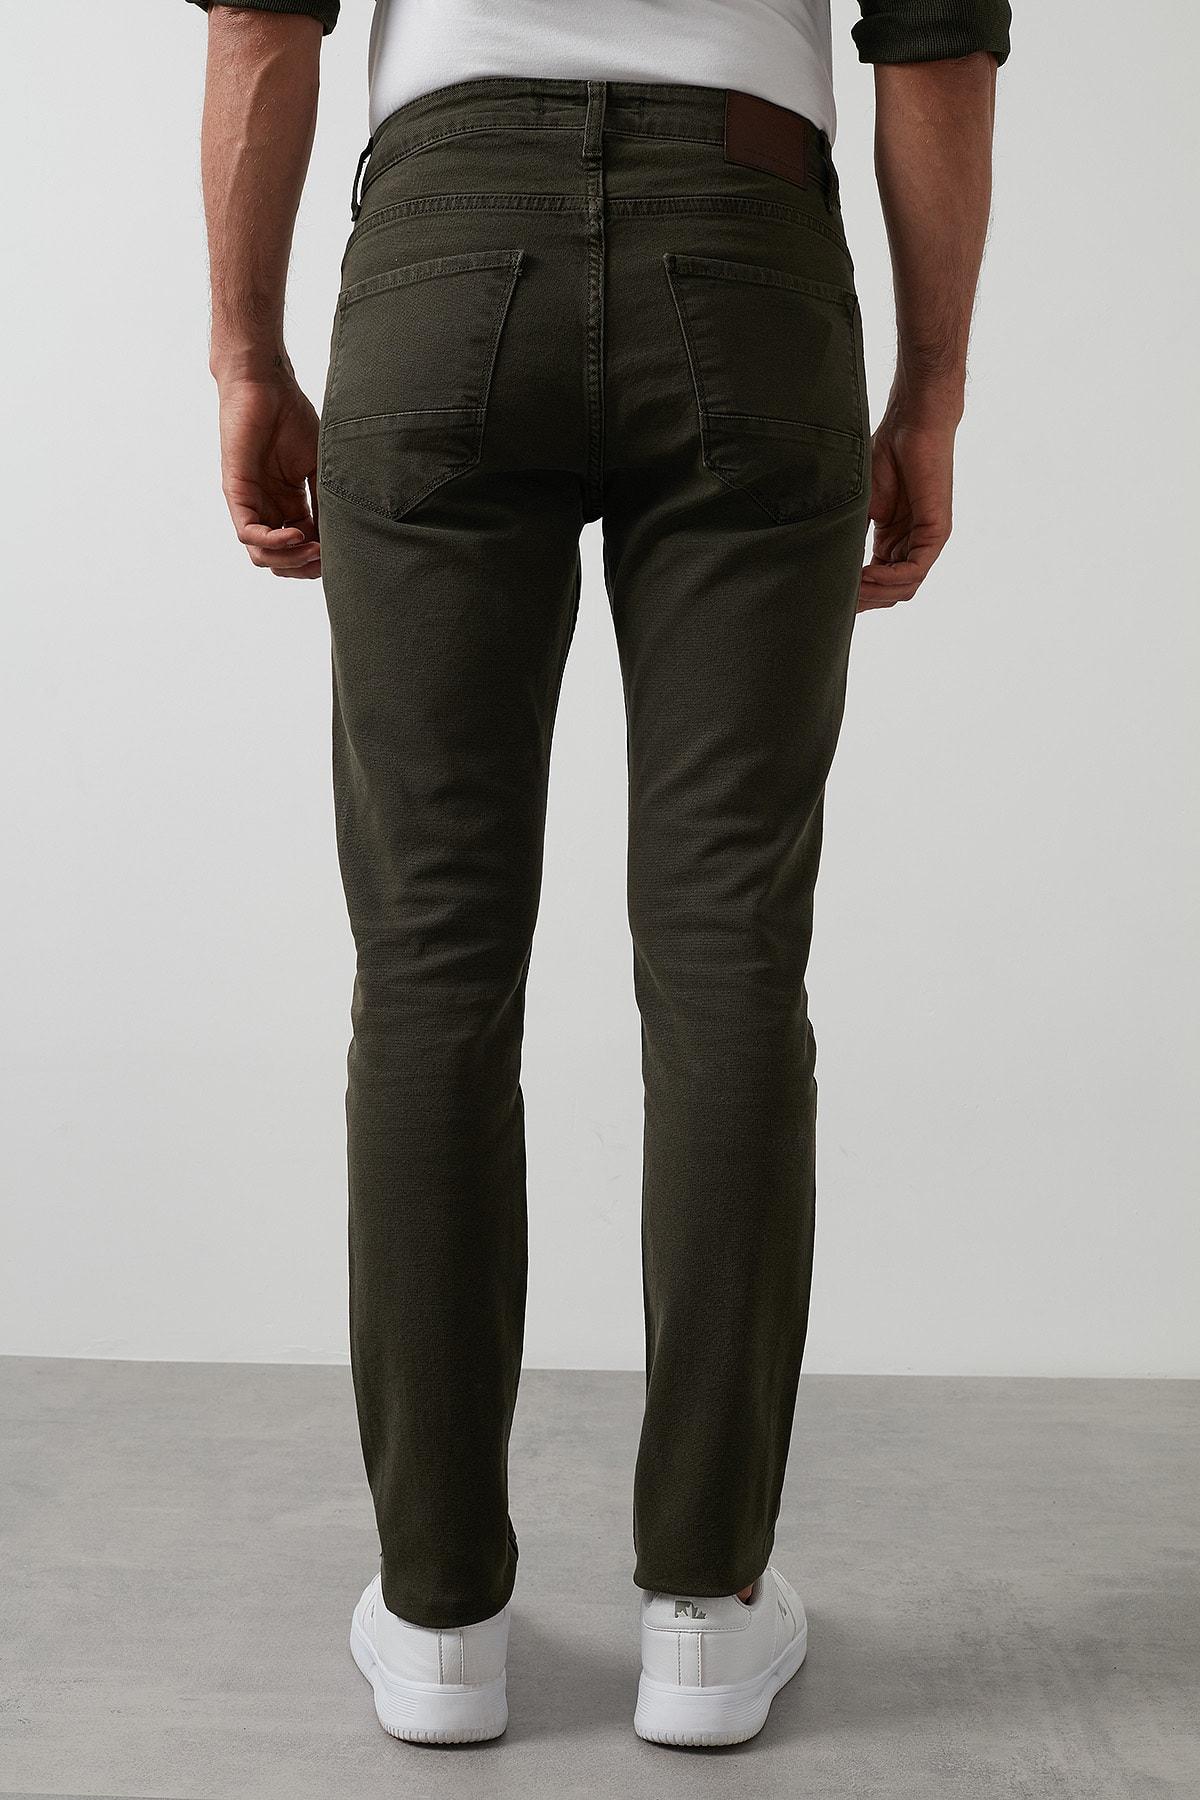 Buratti Erkek Haki 7267f4132zagor Regular Fit Pamuklu Jeans Kot Pantolon 1